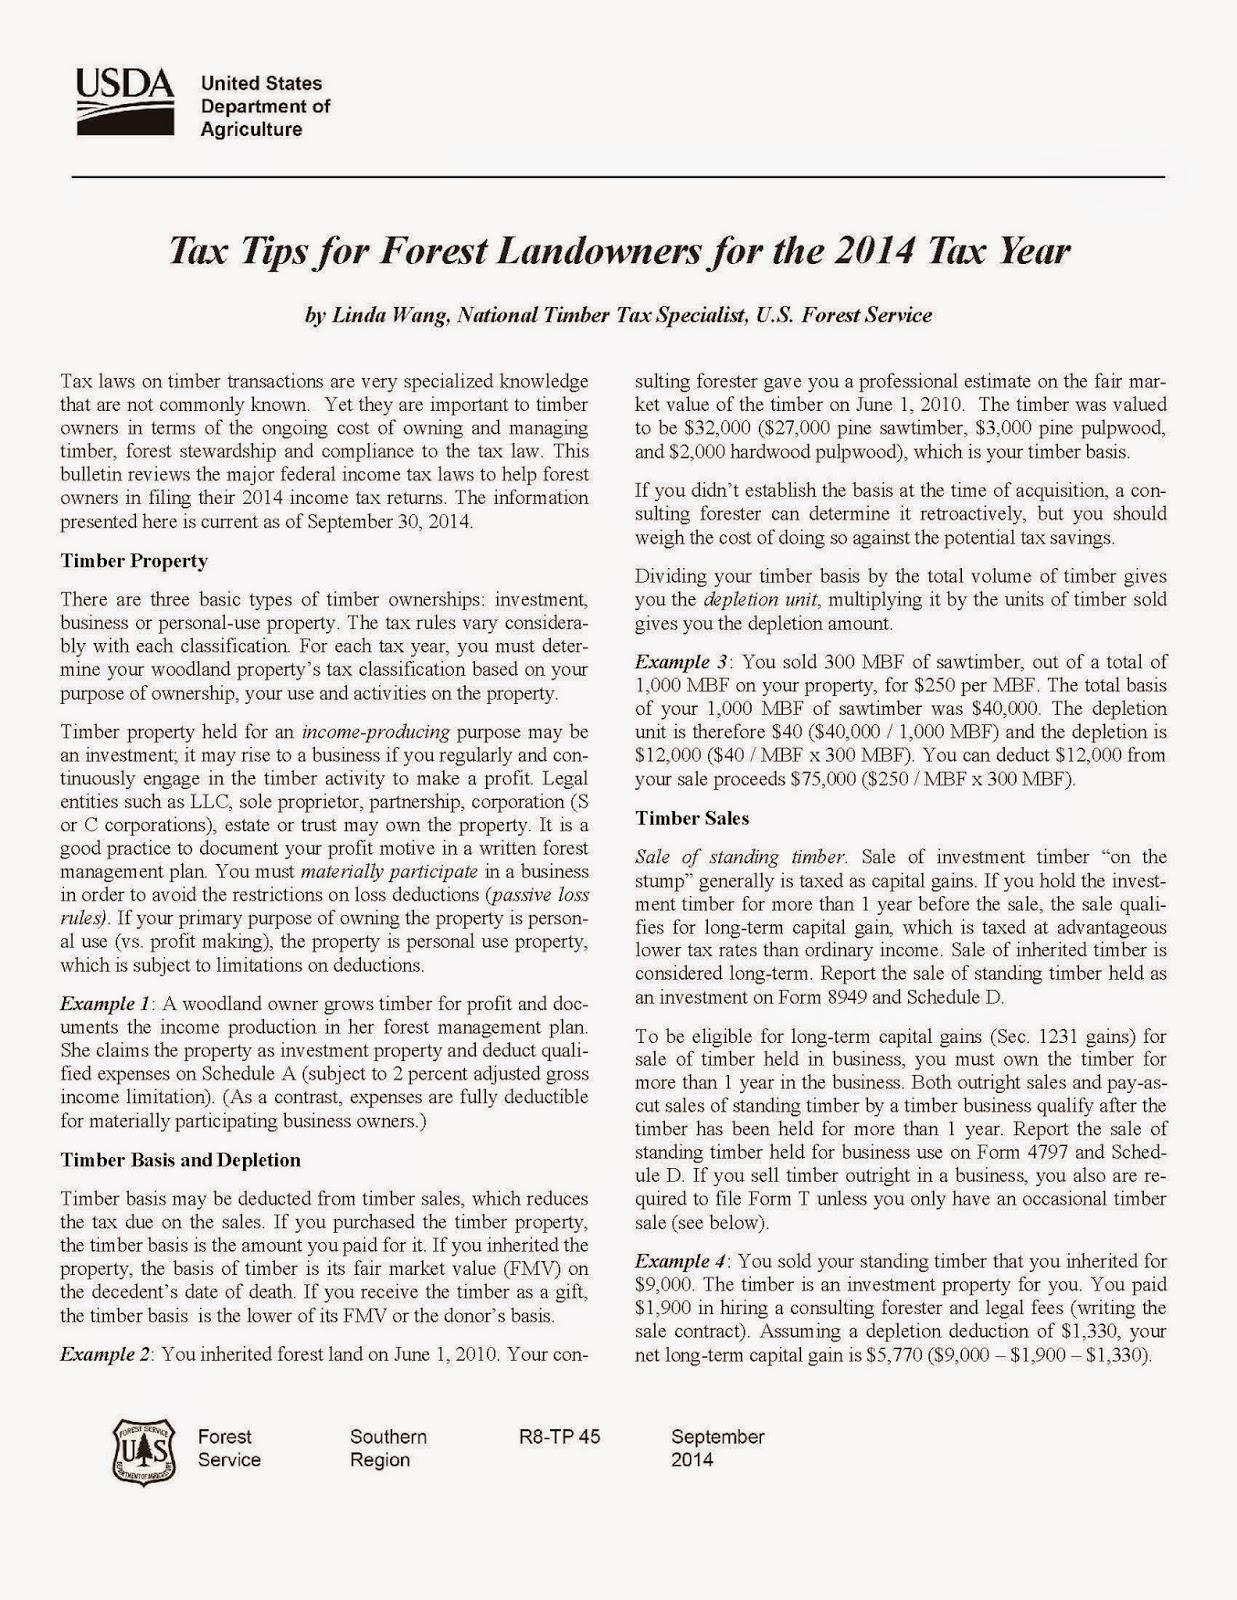 http://www.aces.edu/~henshmd/temp/TaxTips2014.pdf